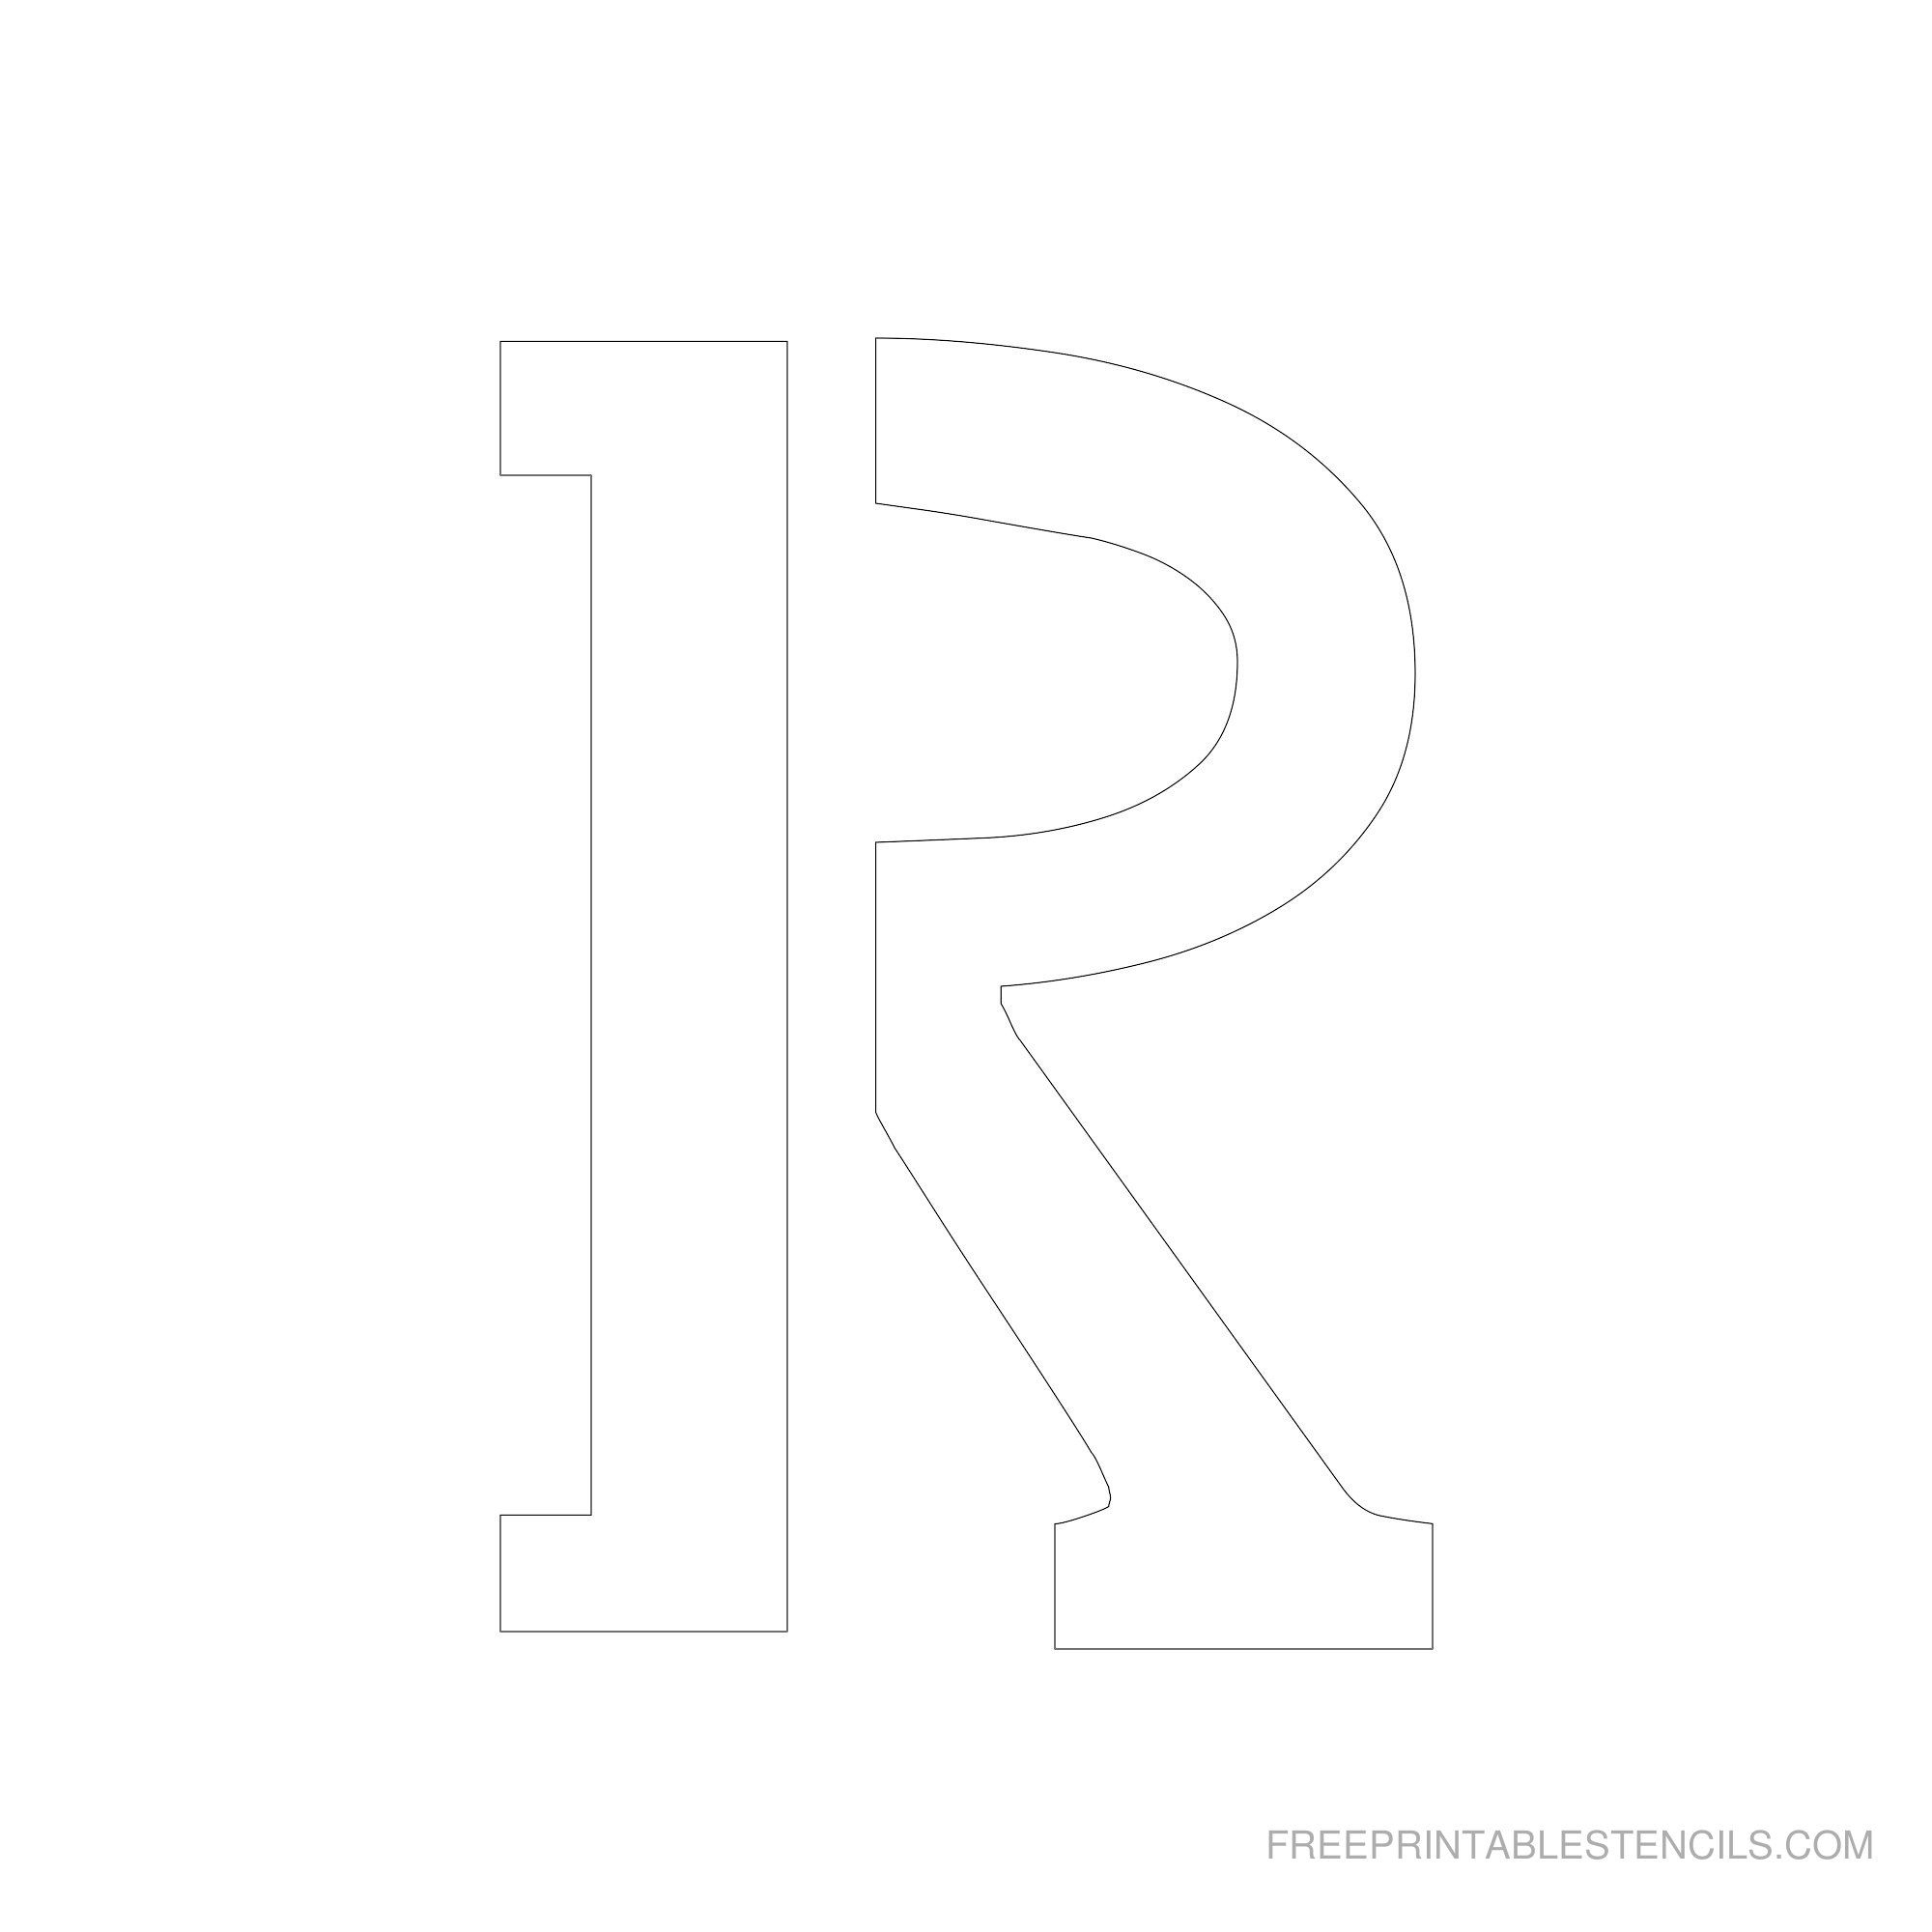 Free Printable Letter Stencils | Free Printable 6 Inch Alphabet - Free Printable 4 Inch Number Stencils